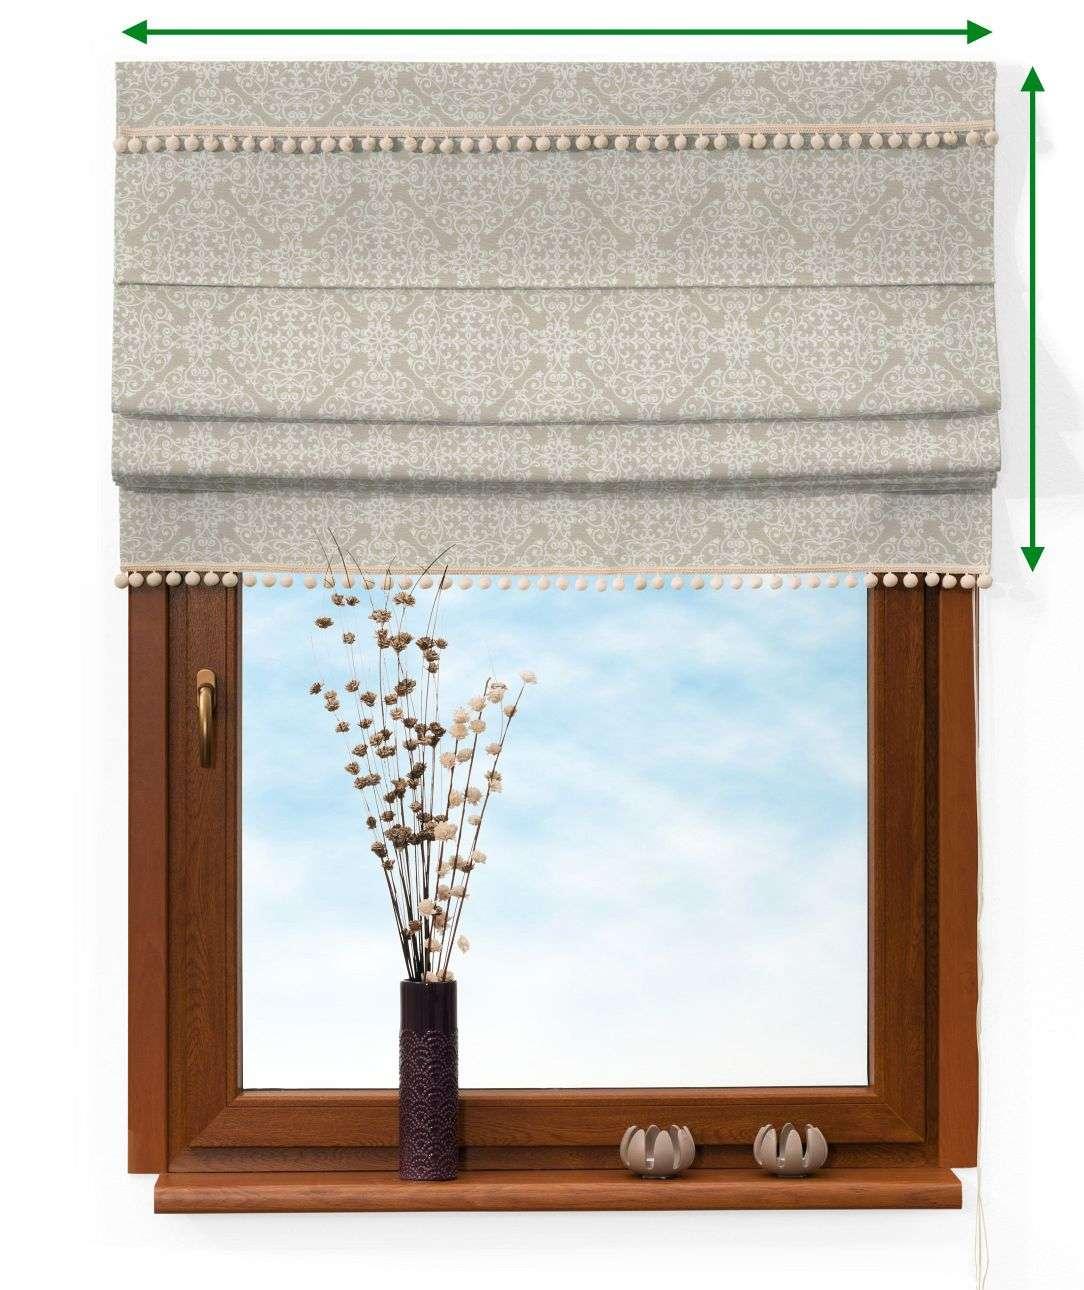 Roleta rímska s brmbolcami V kolekcii Flowers, tkanina: 140-39